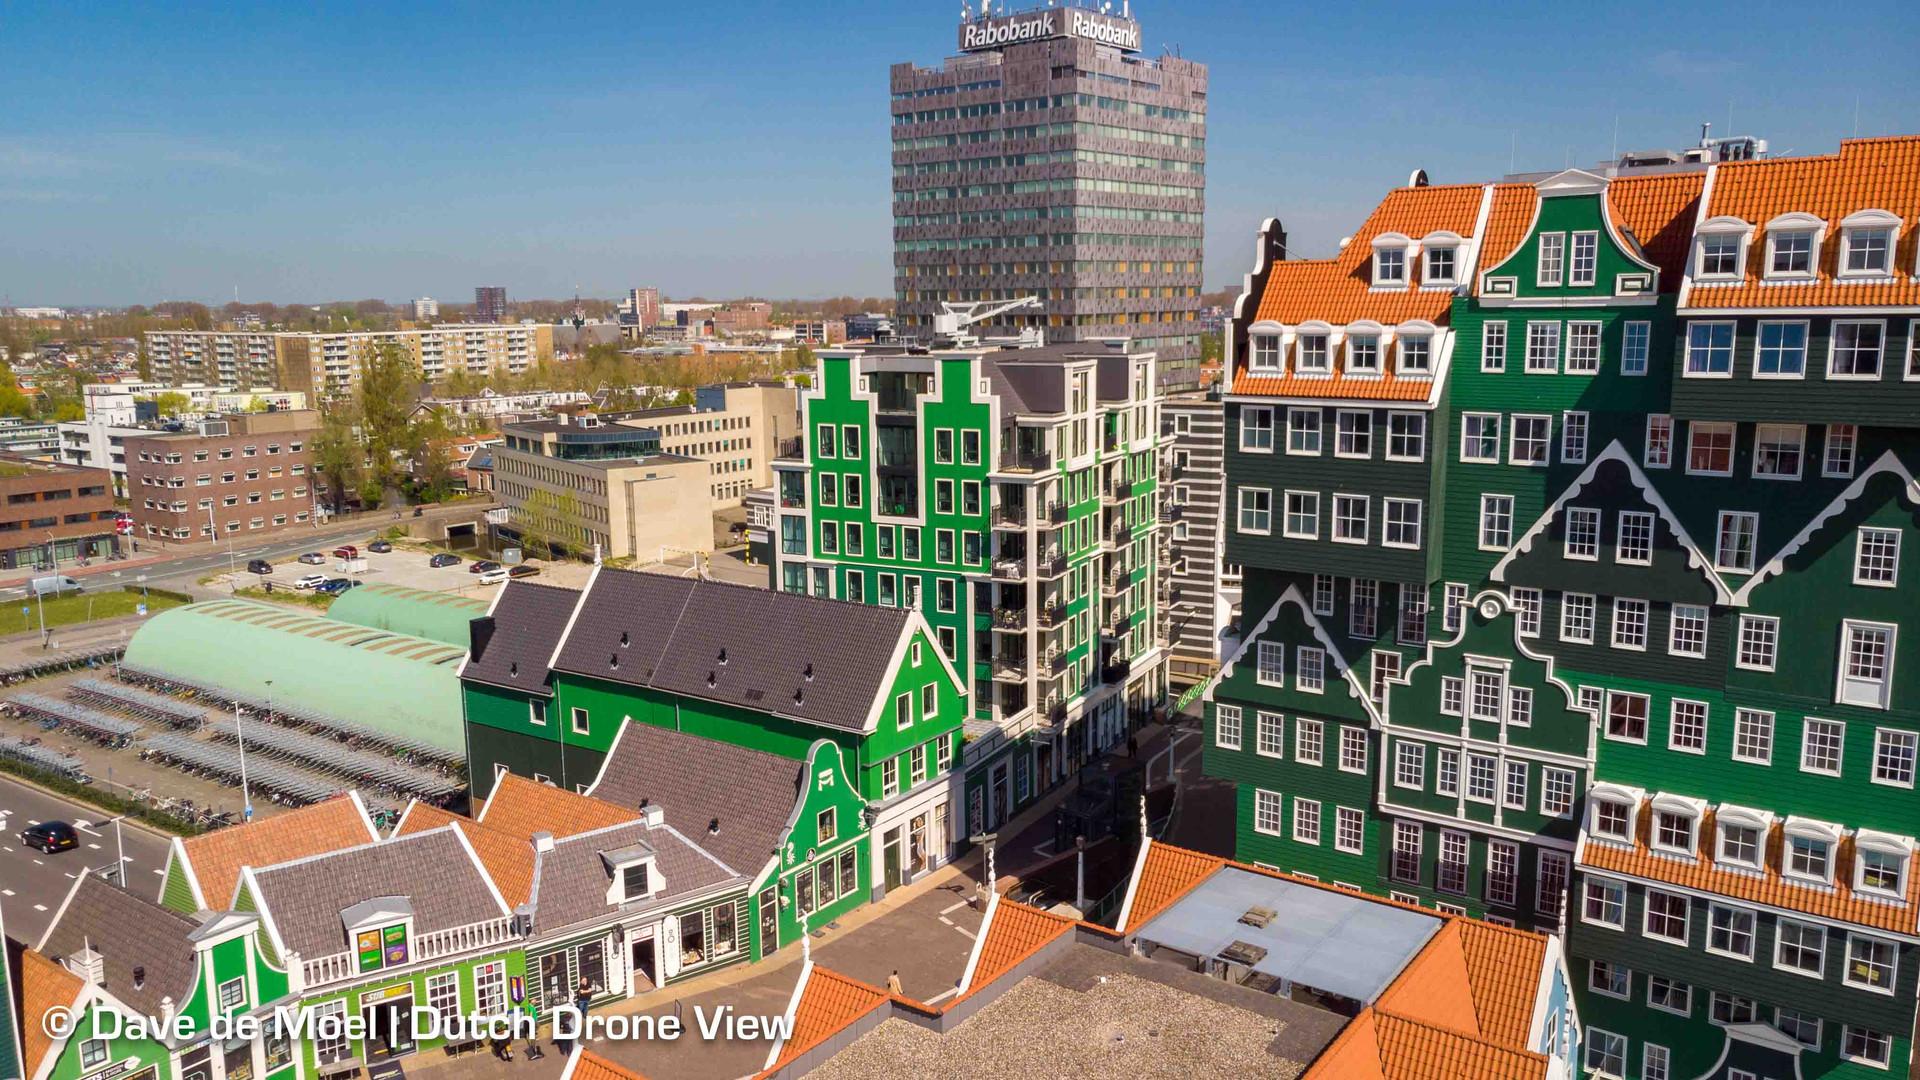 Romanov | Dutch Drone View